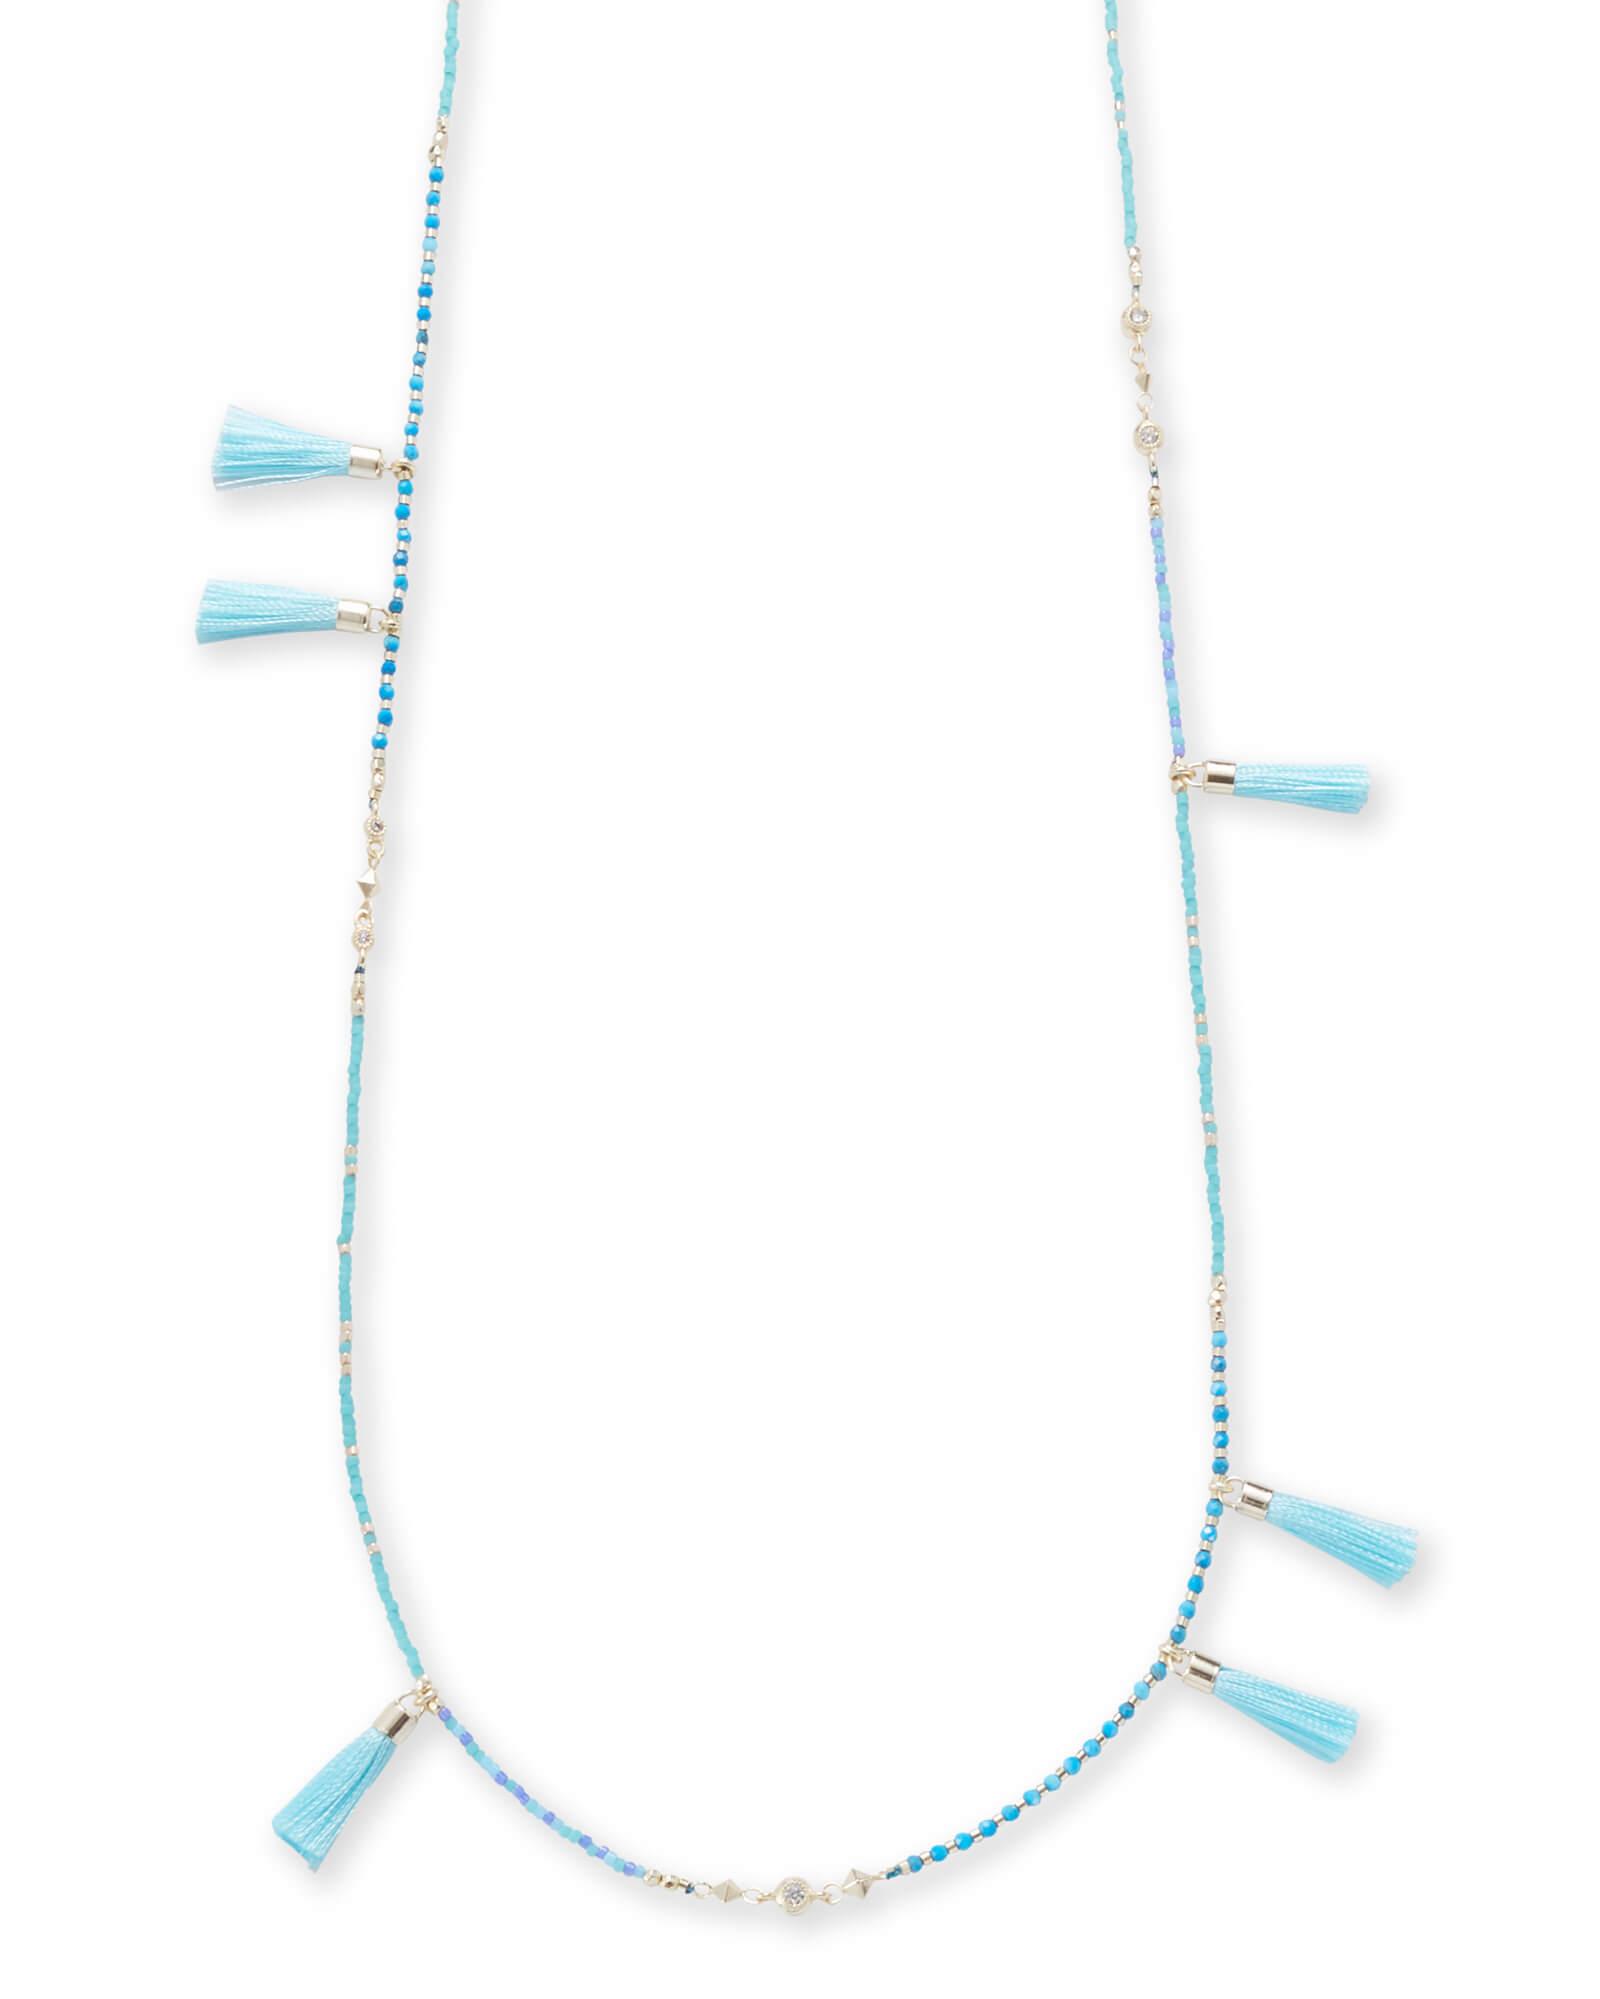 kendra-scott-augusta-long-tassel-necklace-in-aqua-howlite_00_default_lg.jpg